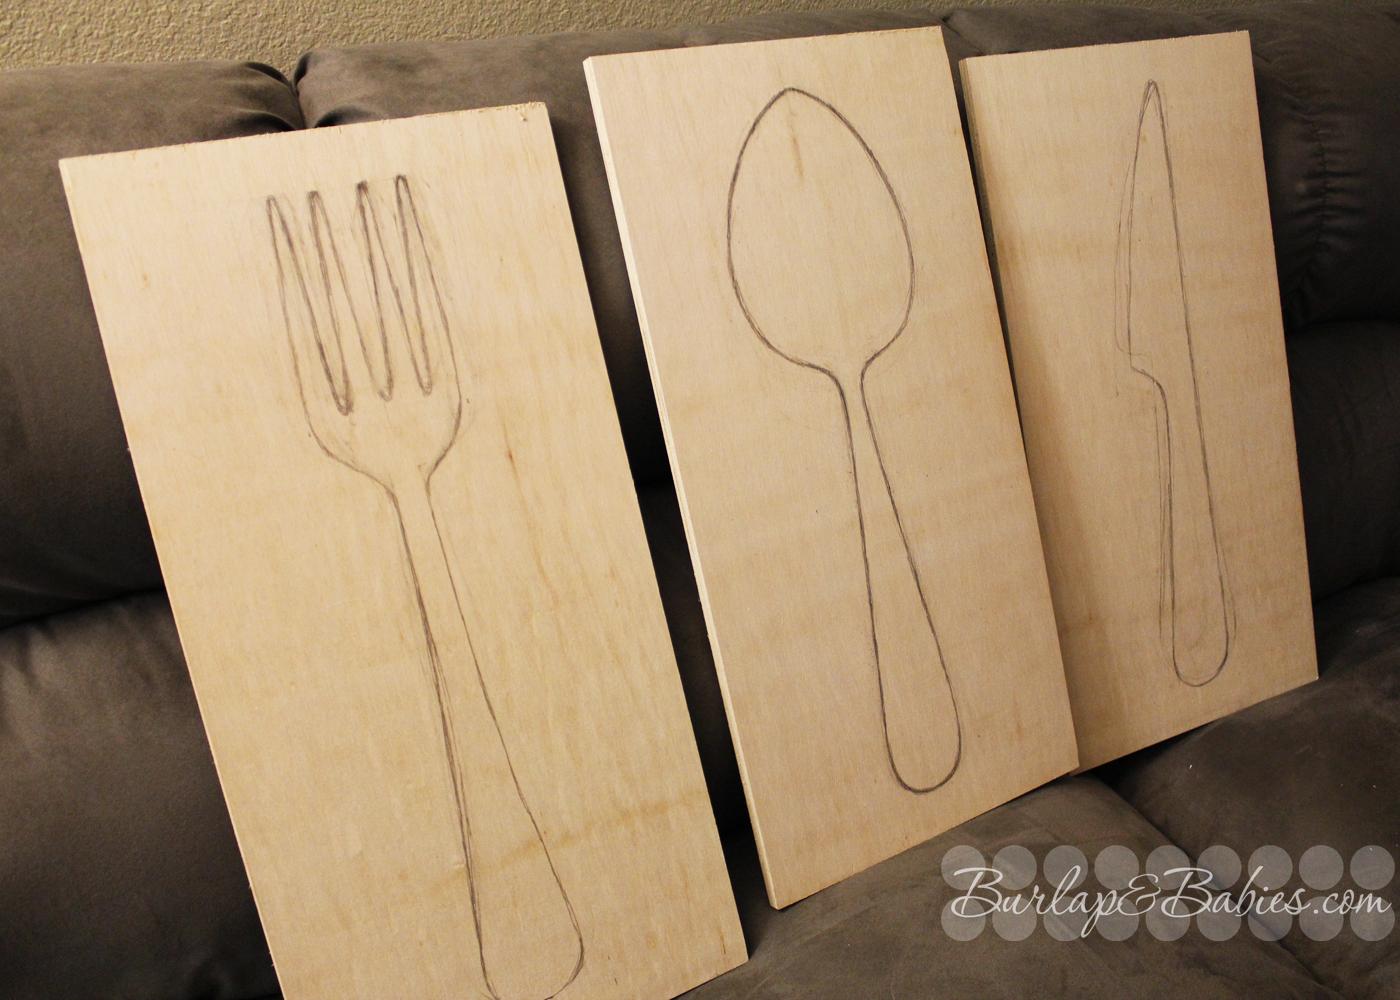 Giant utensil wall art burlap and babies for Dining room utensils